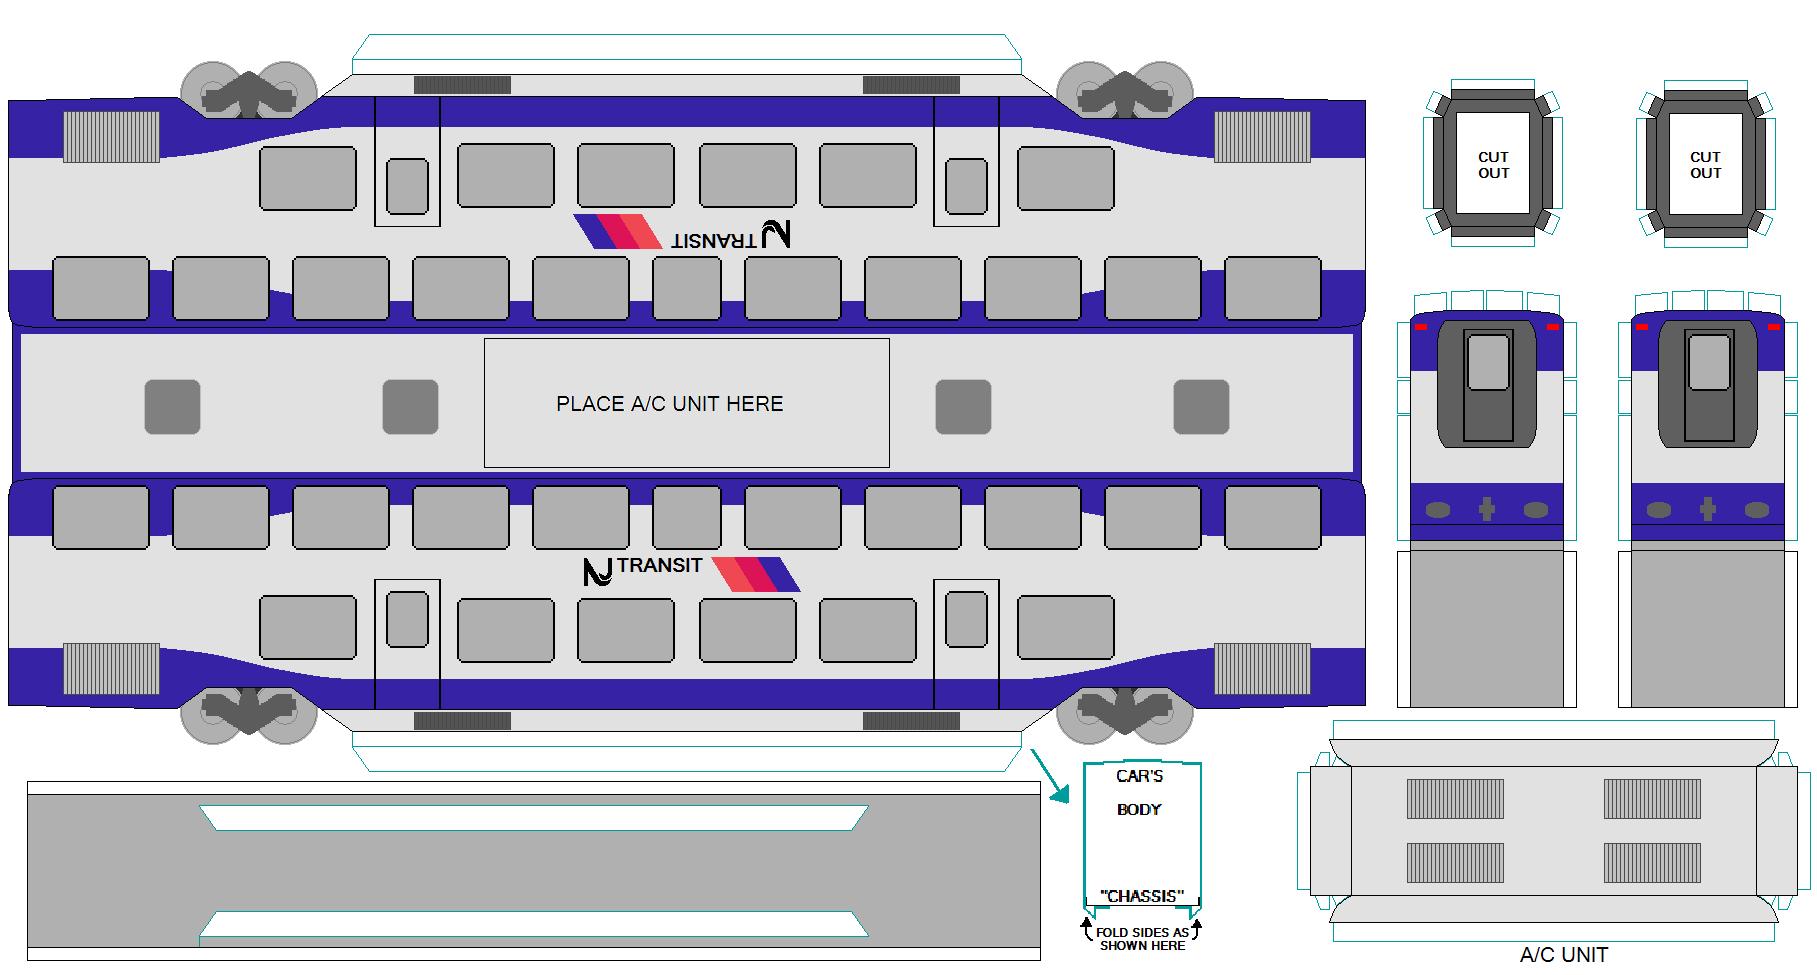 NewJersey__livery2__bi_level_train_car.PNG